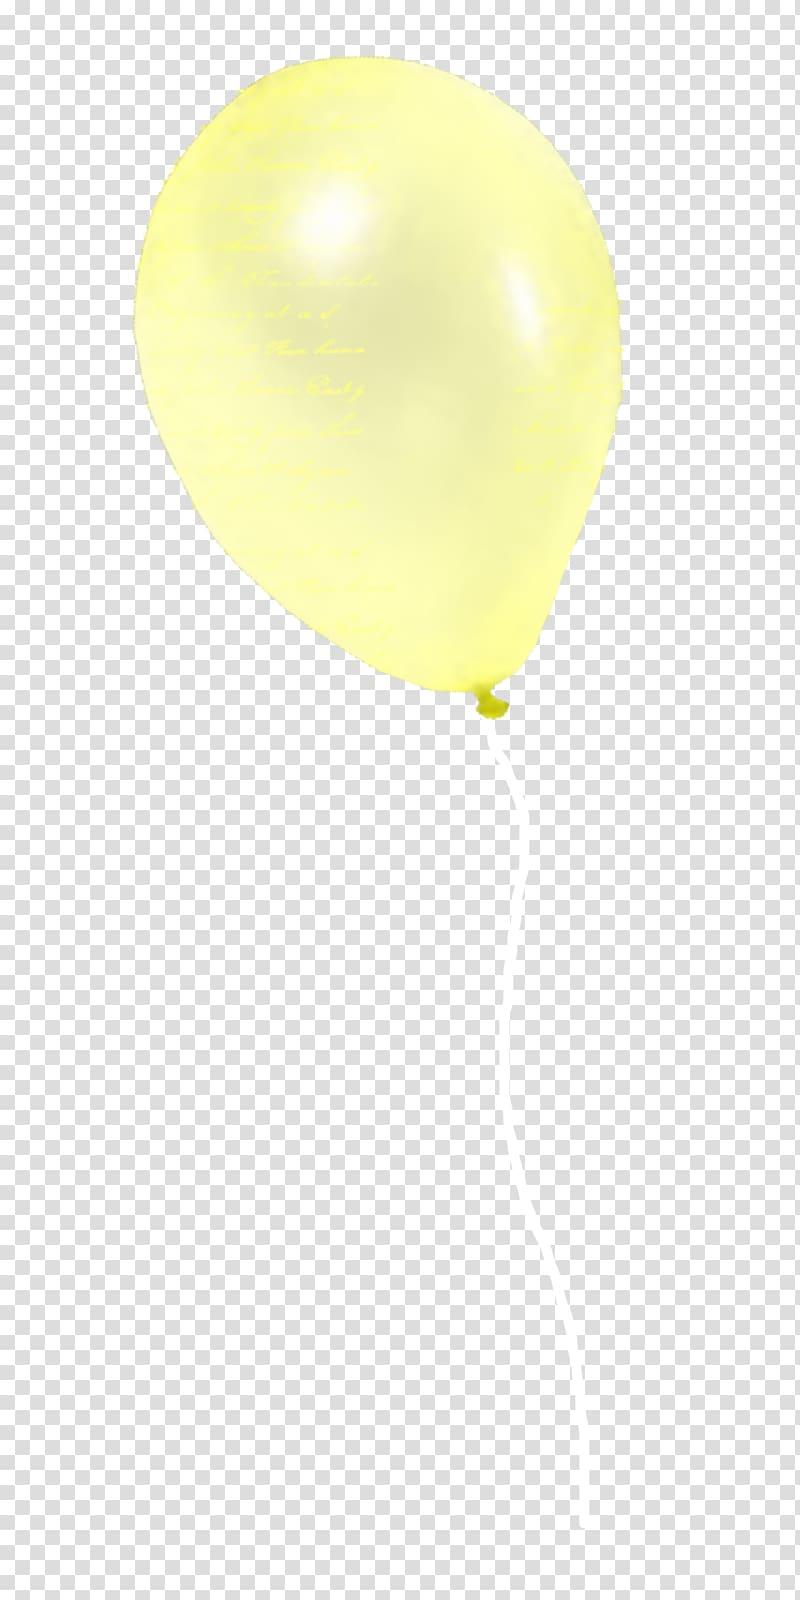 Balloon Yellow, Yellow Balloon transparent background PNG.